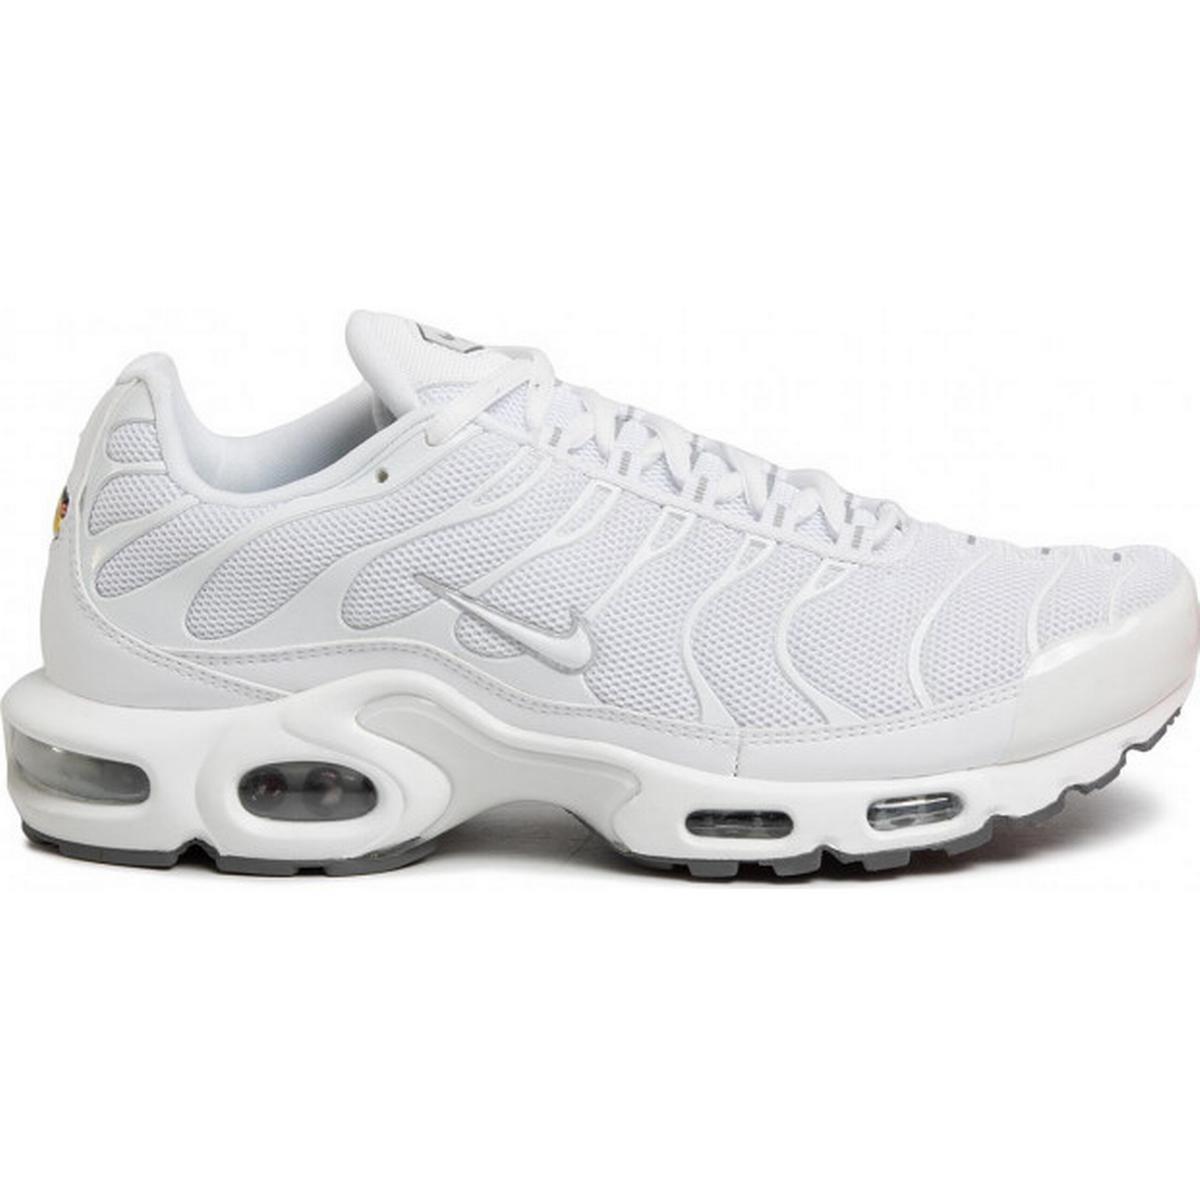 Nike air max plus • Hitta det lägsta priset hos PriceRunner nu »